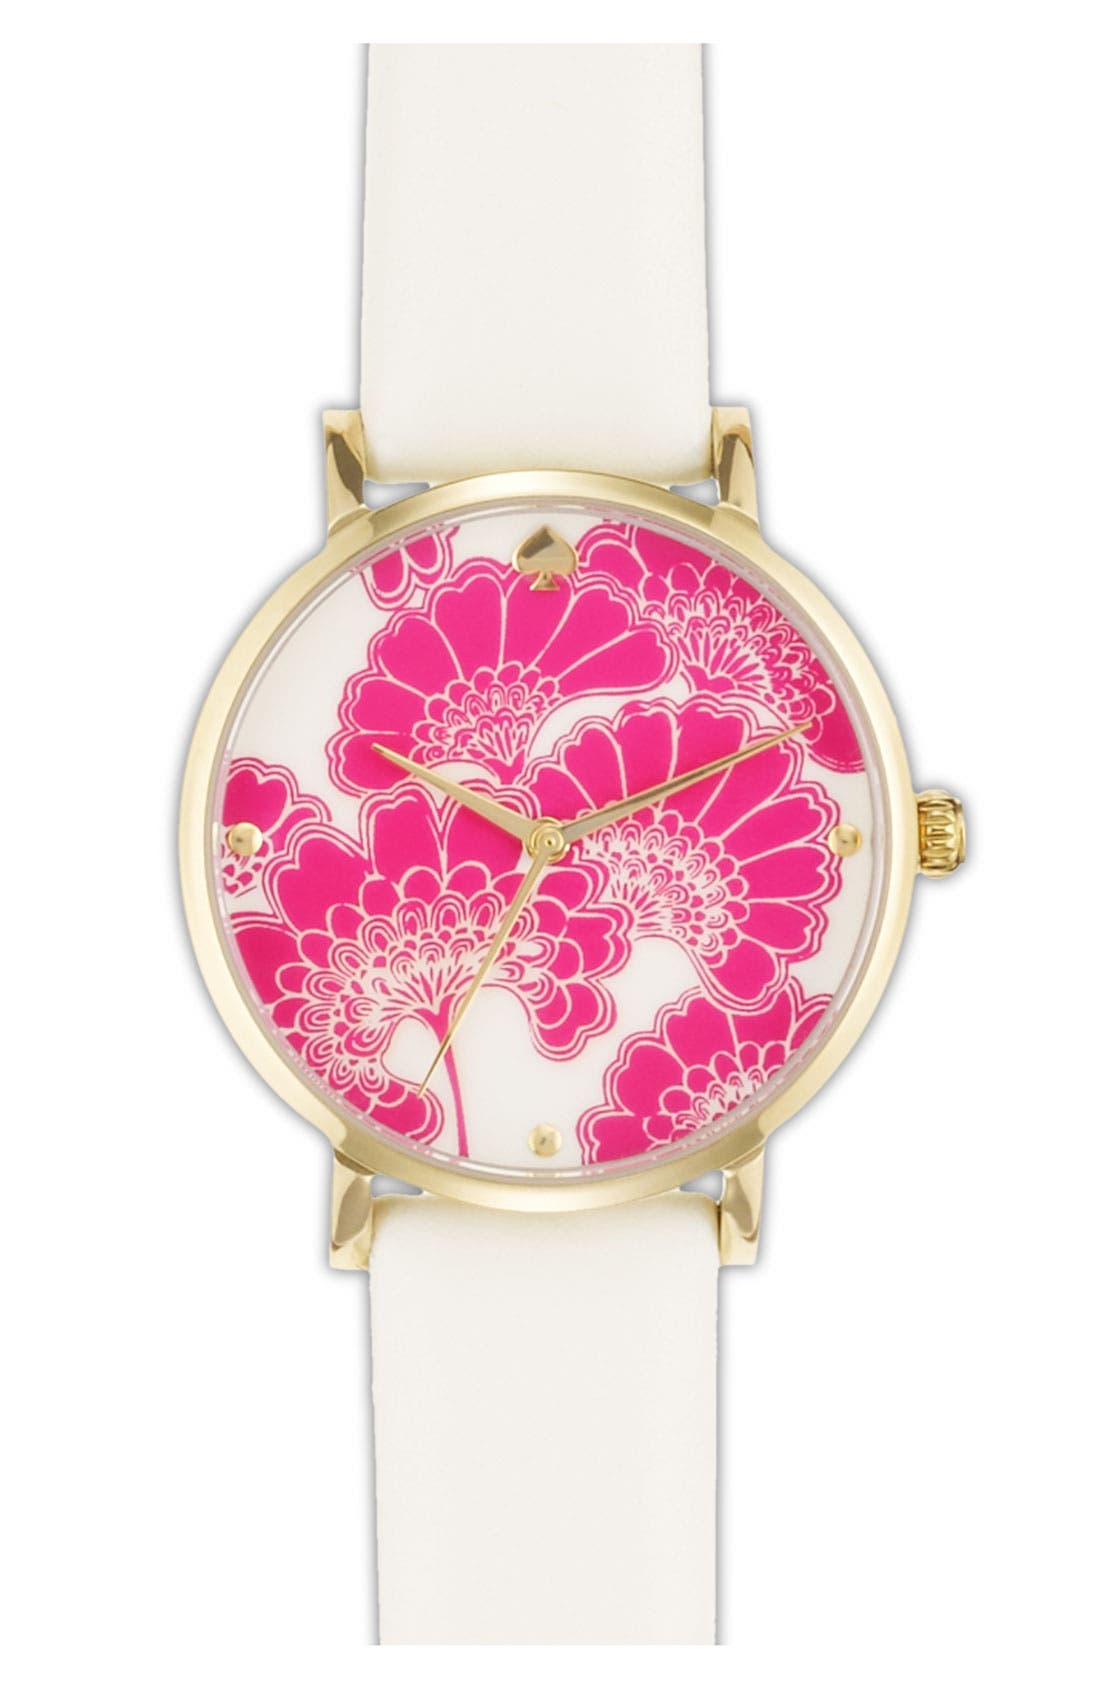 Main Image - kate spade new york 'metro' patterned dial watch, 34mm